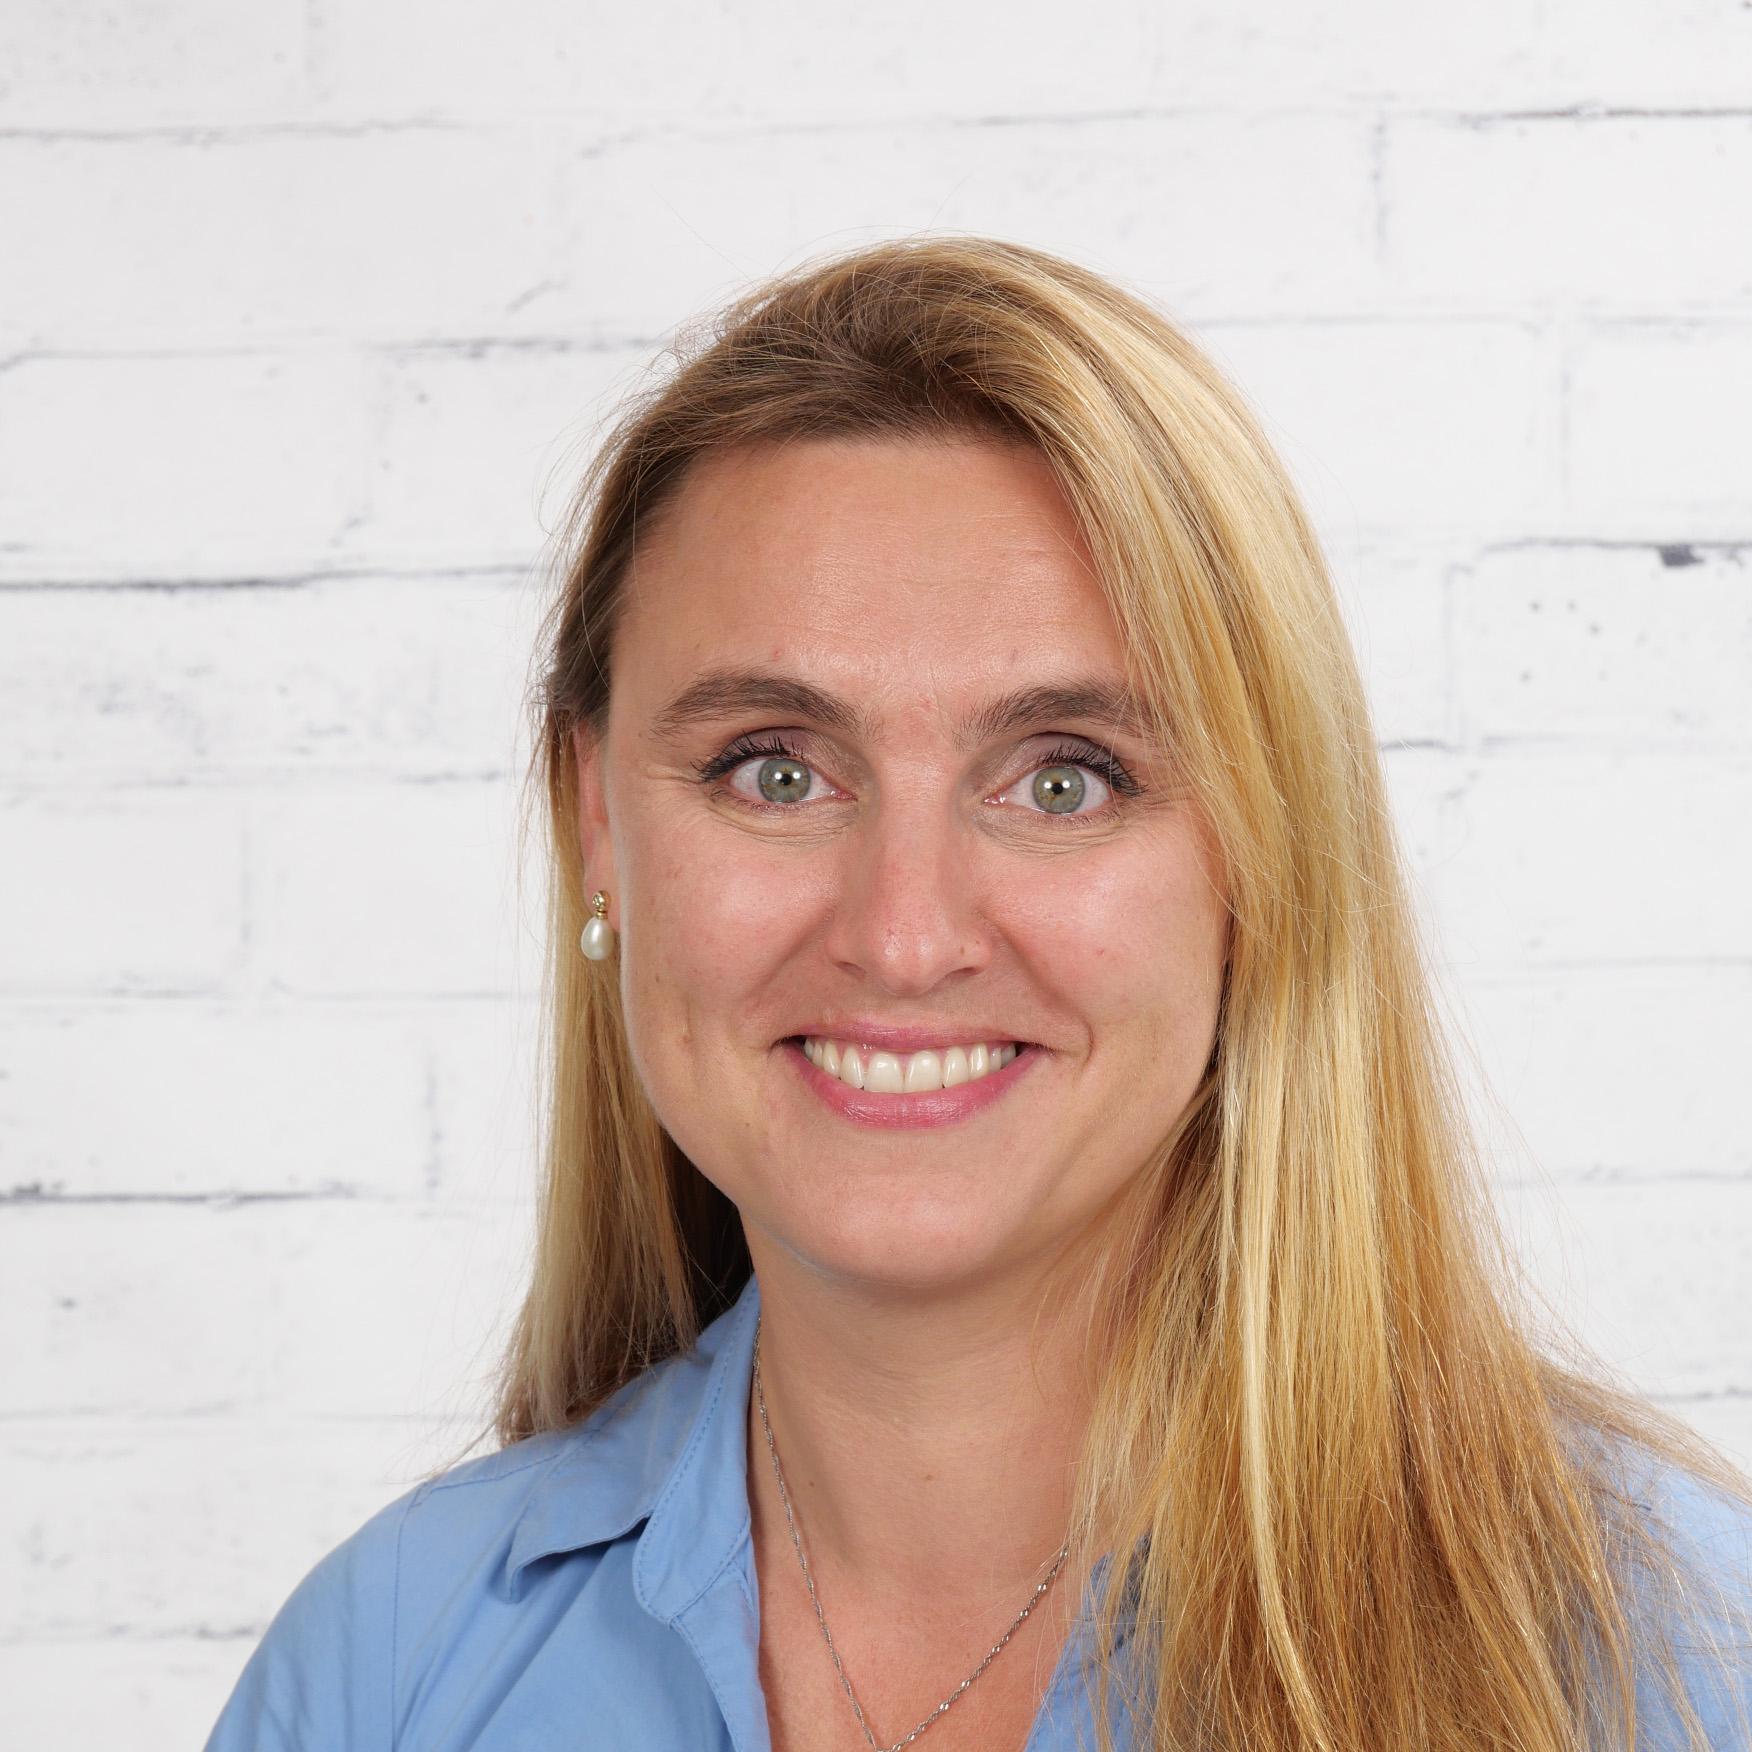 Profilbild von Sonja Jacobs